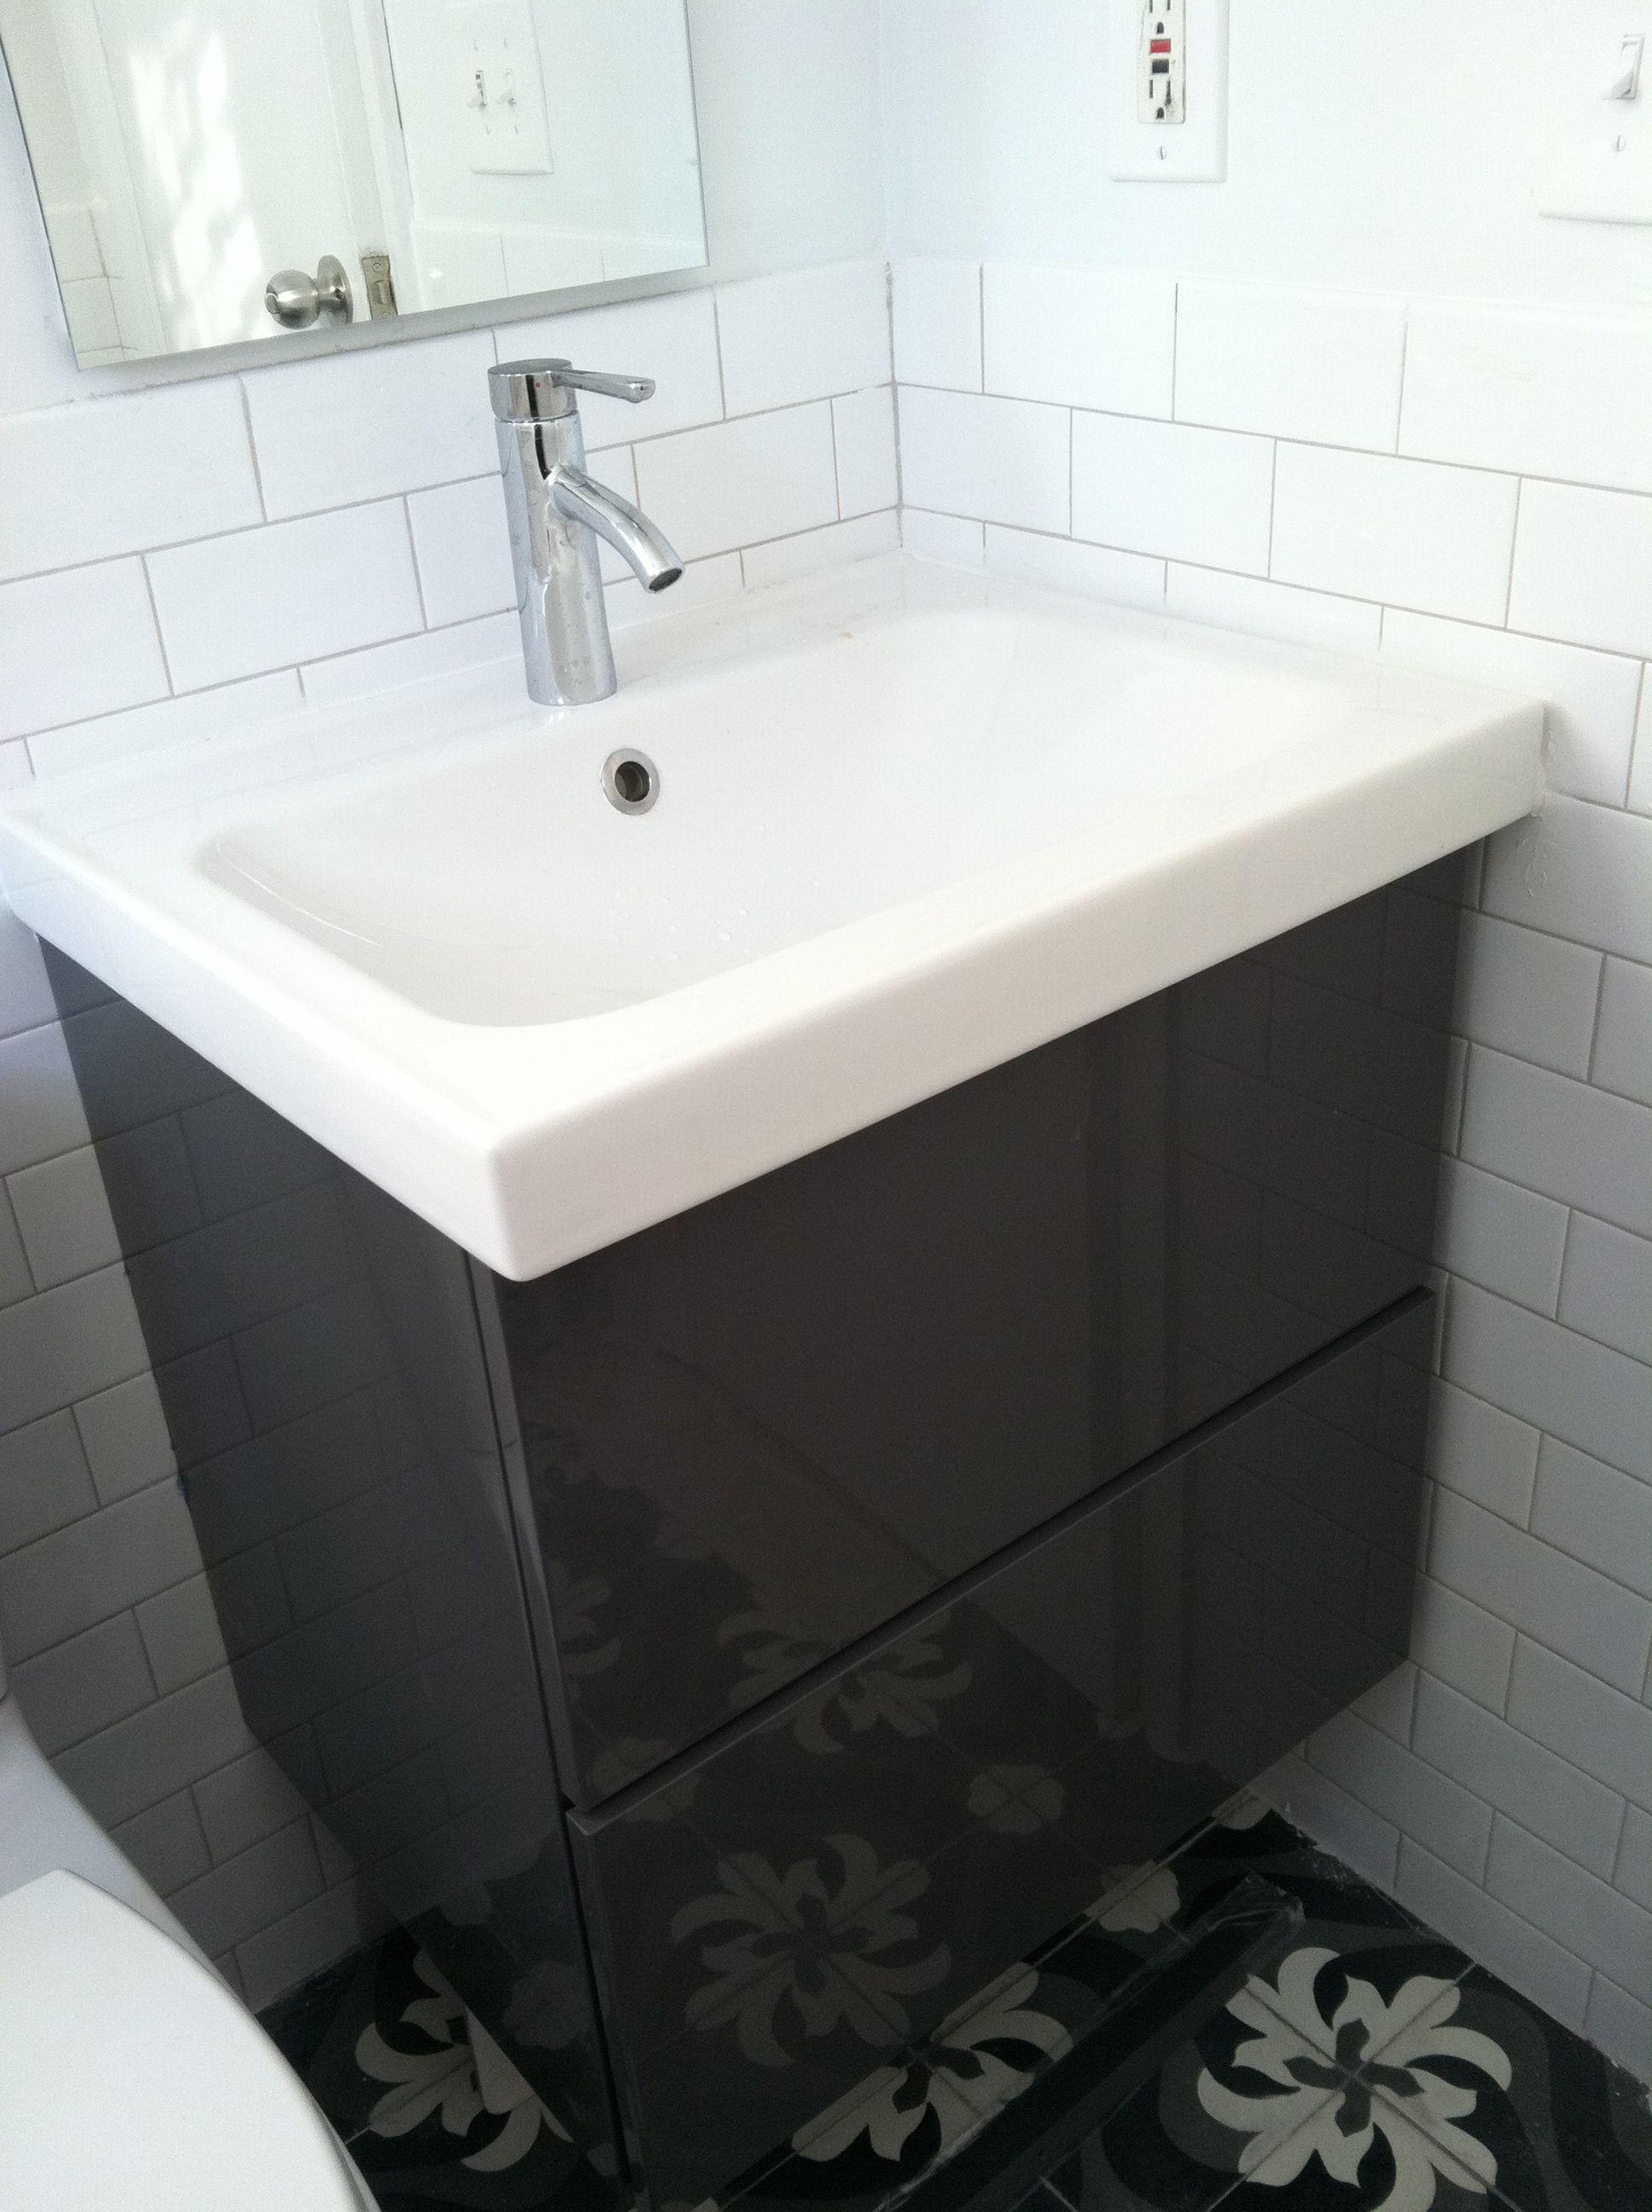 Ikea Badezimmer Waschbecken Schrank Ikea Badezimmer Badezimmer